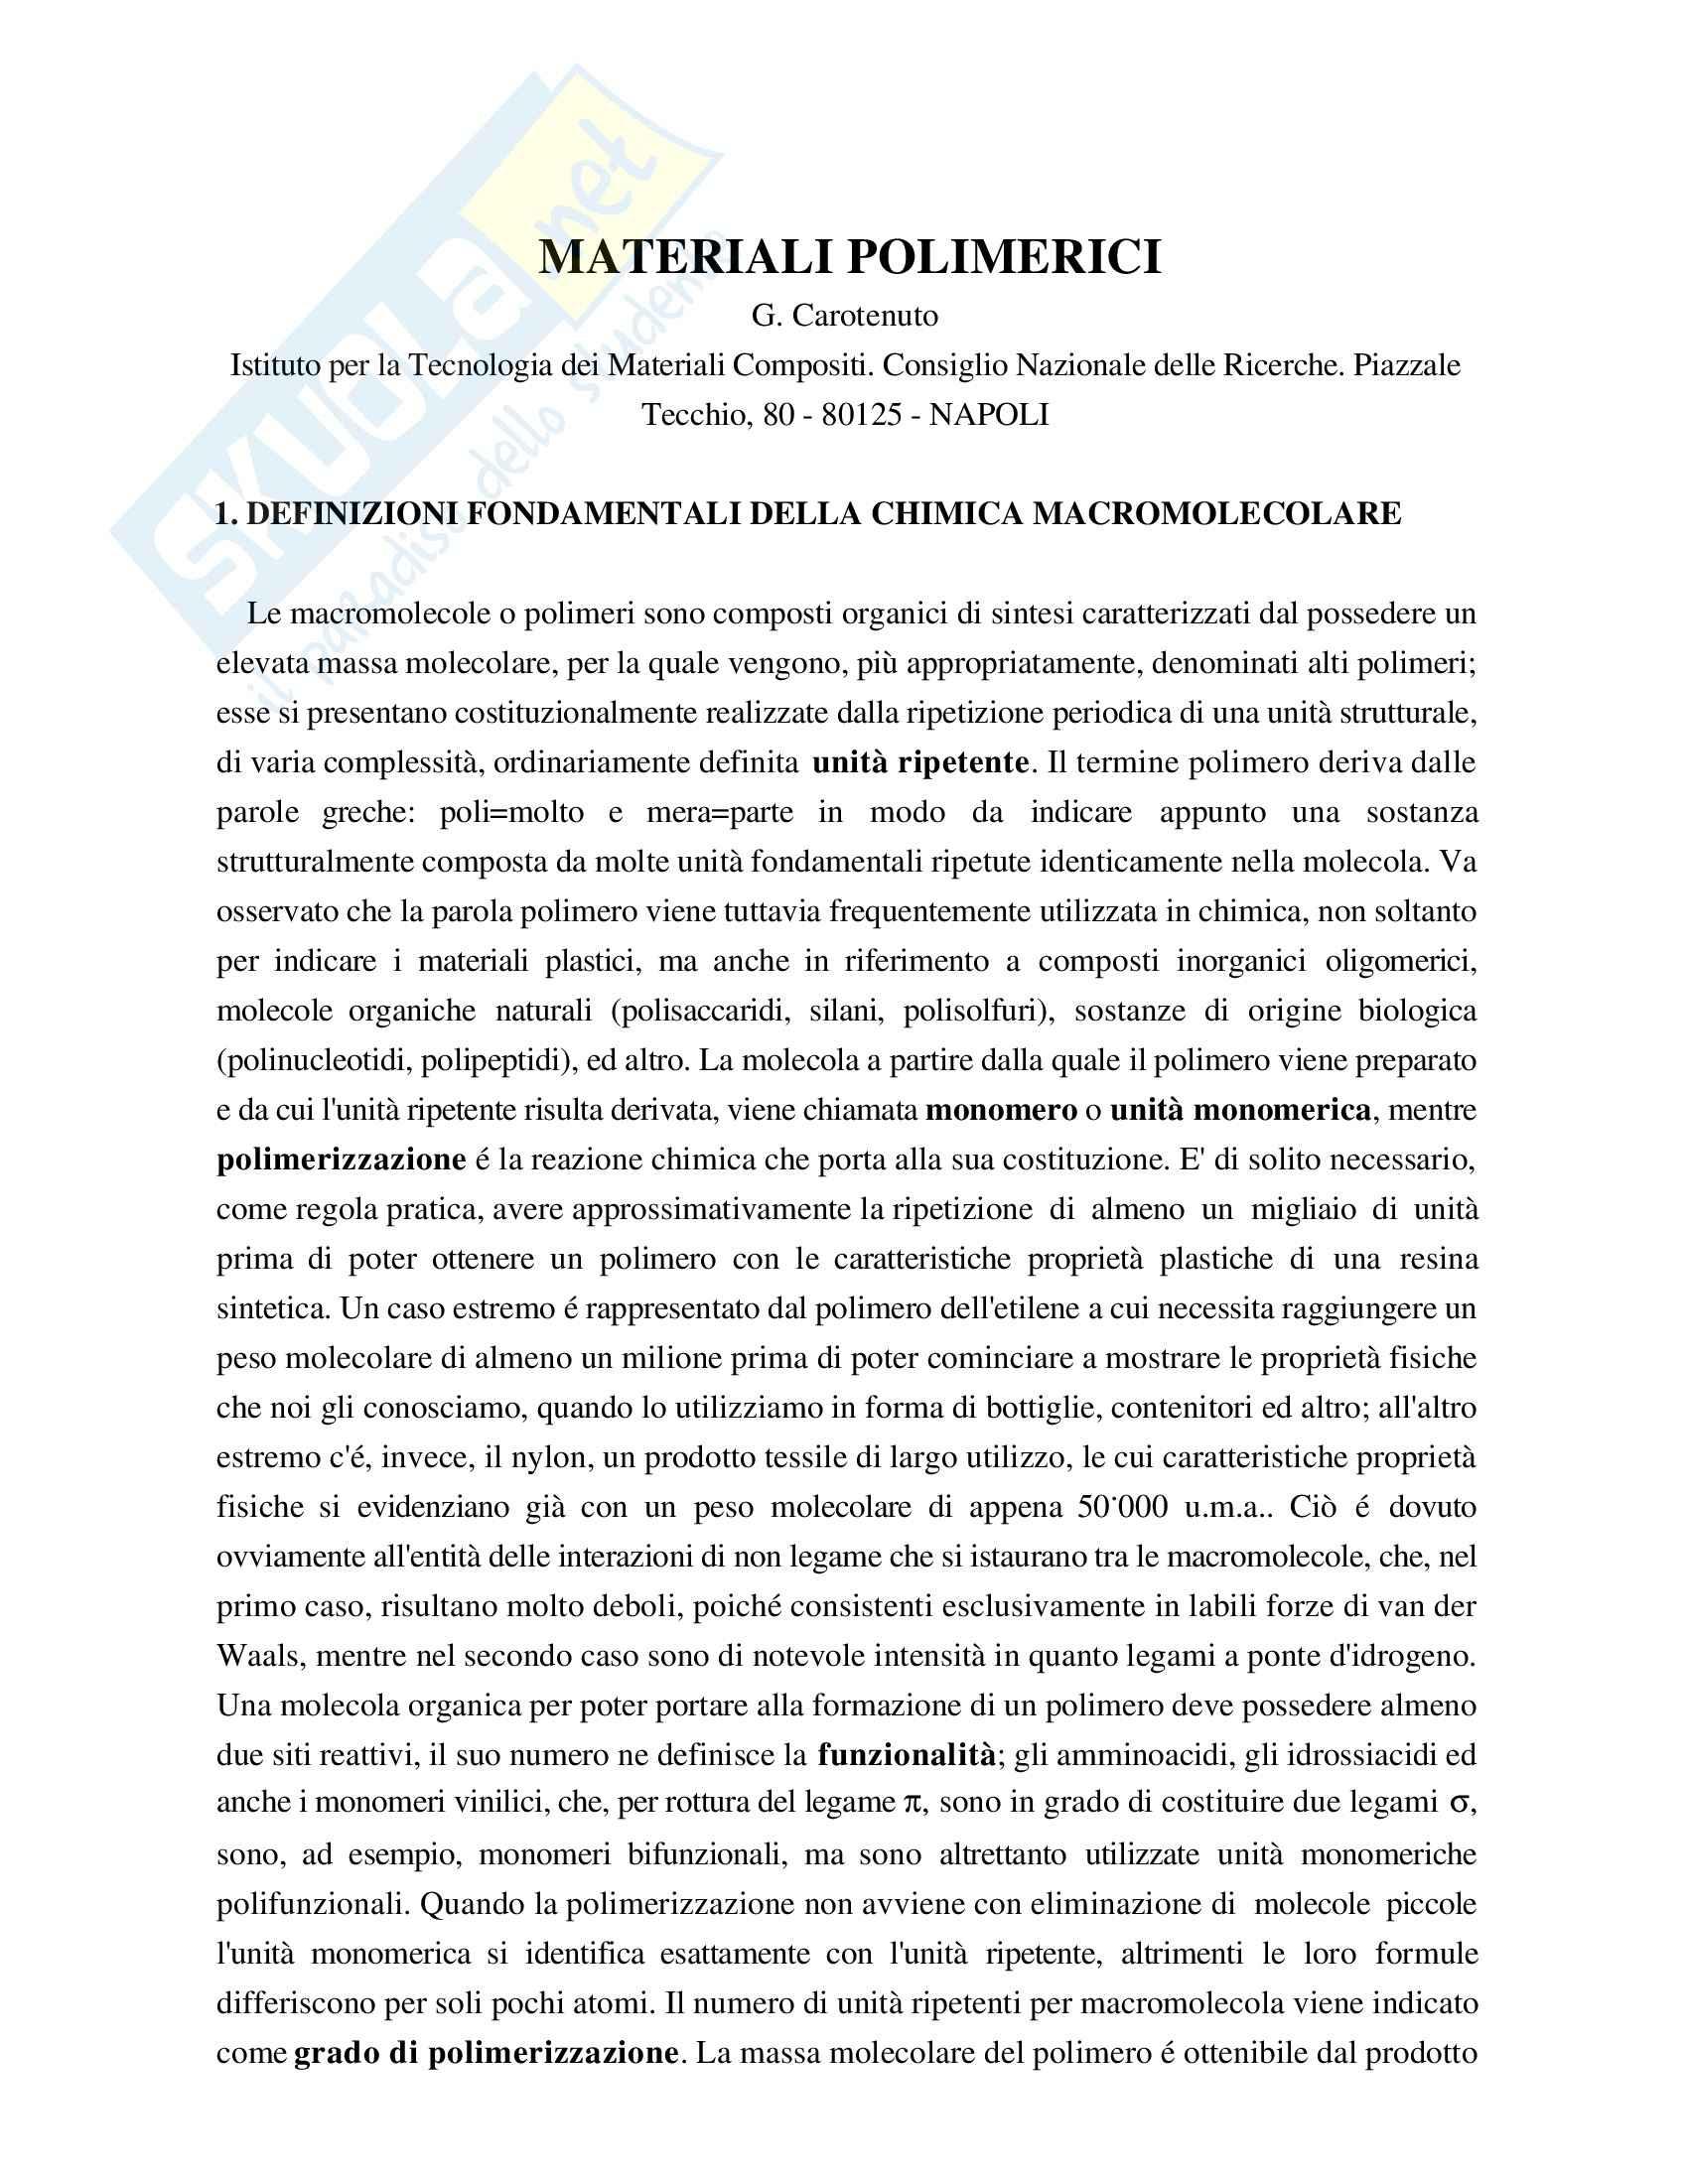 Chimica farmaceutica - materiali polimerici